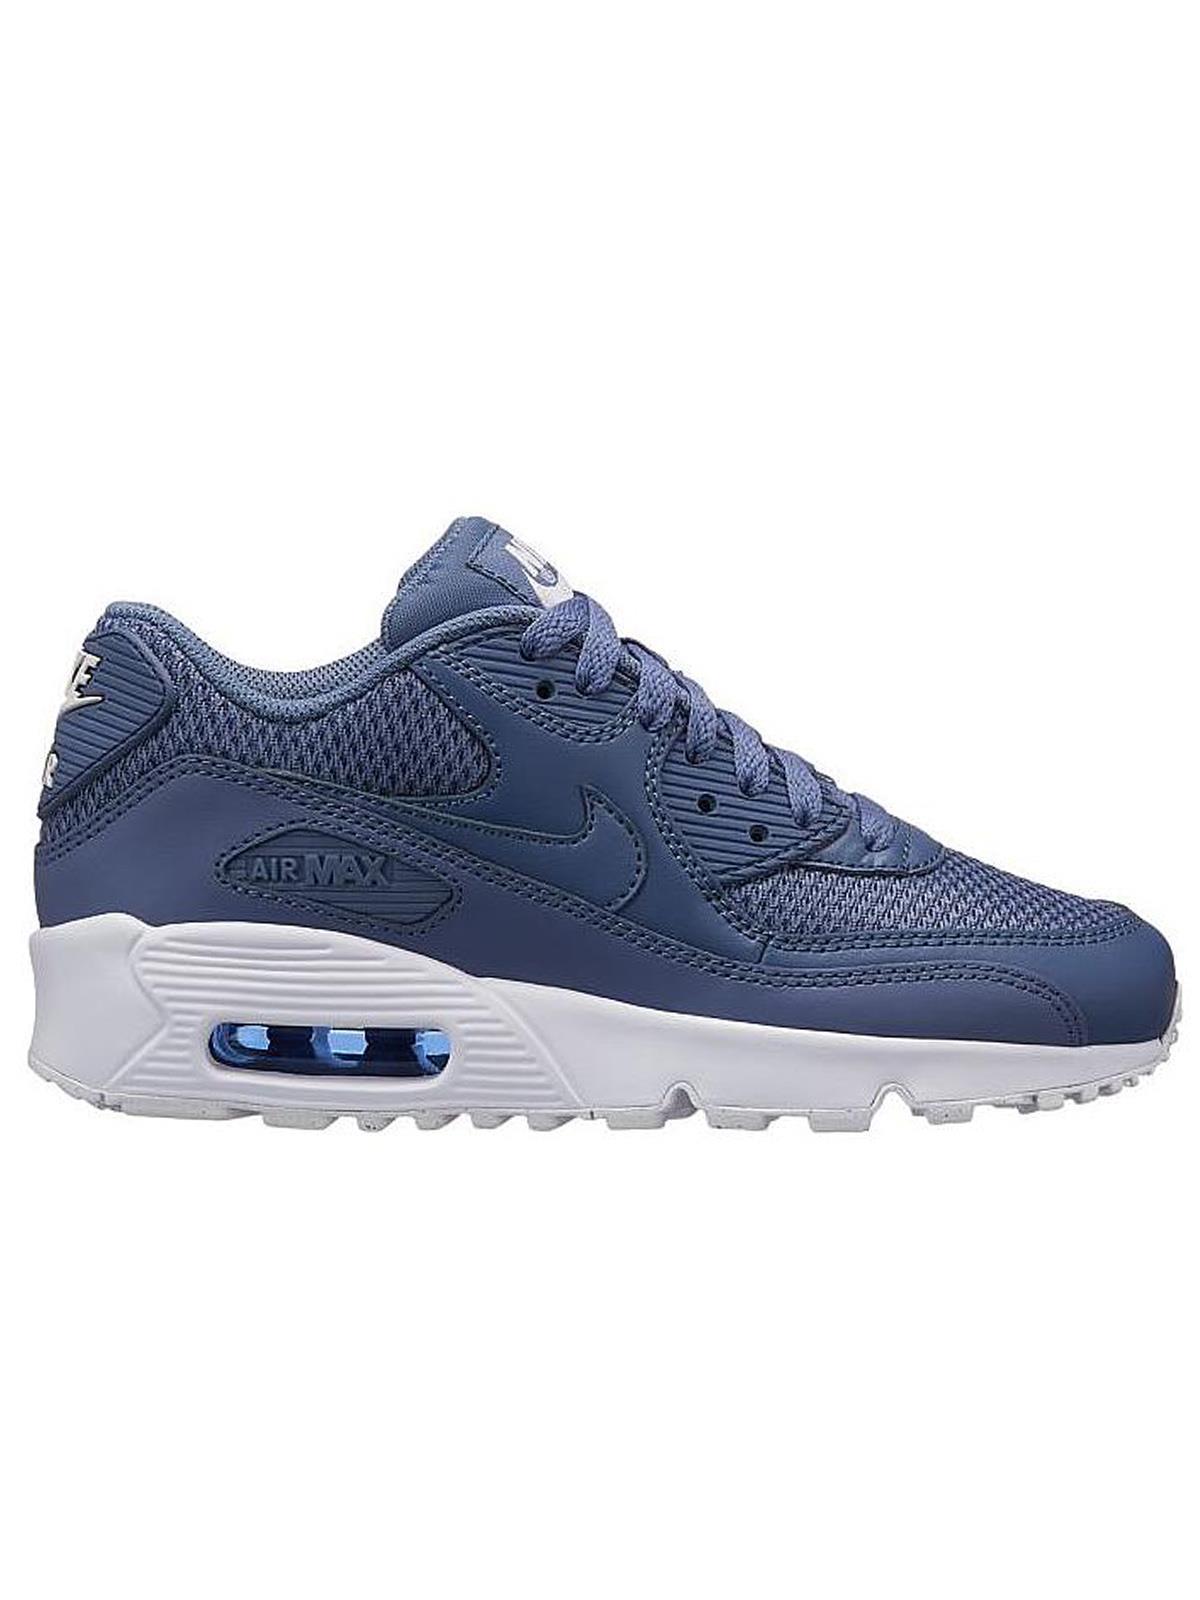 Nike AIR MAX 90 Mesh Ragazza/o 833418 409